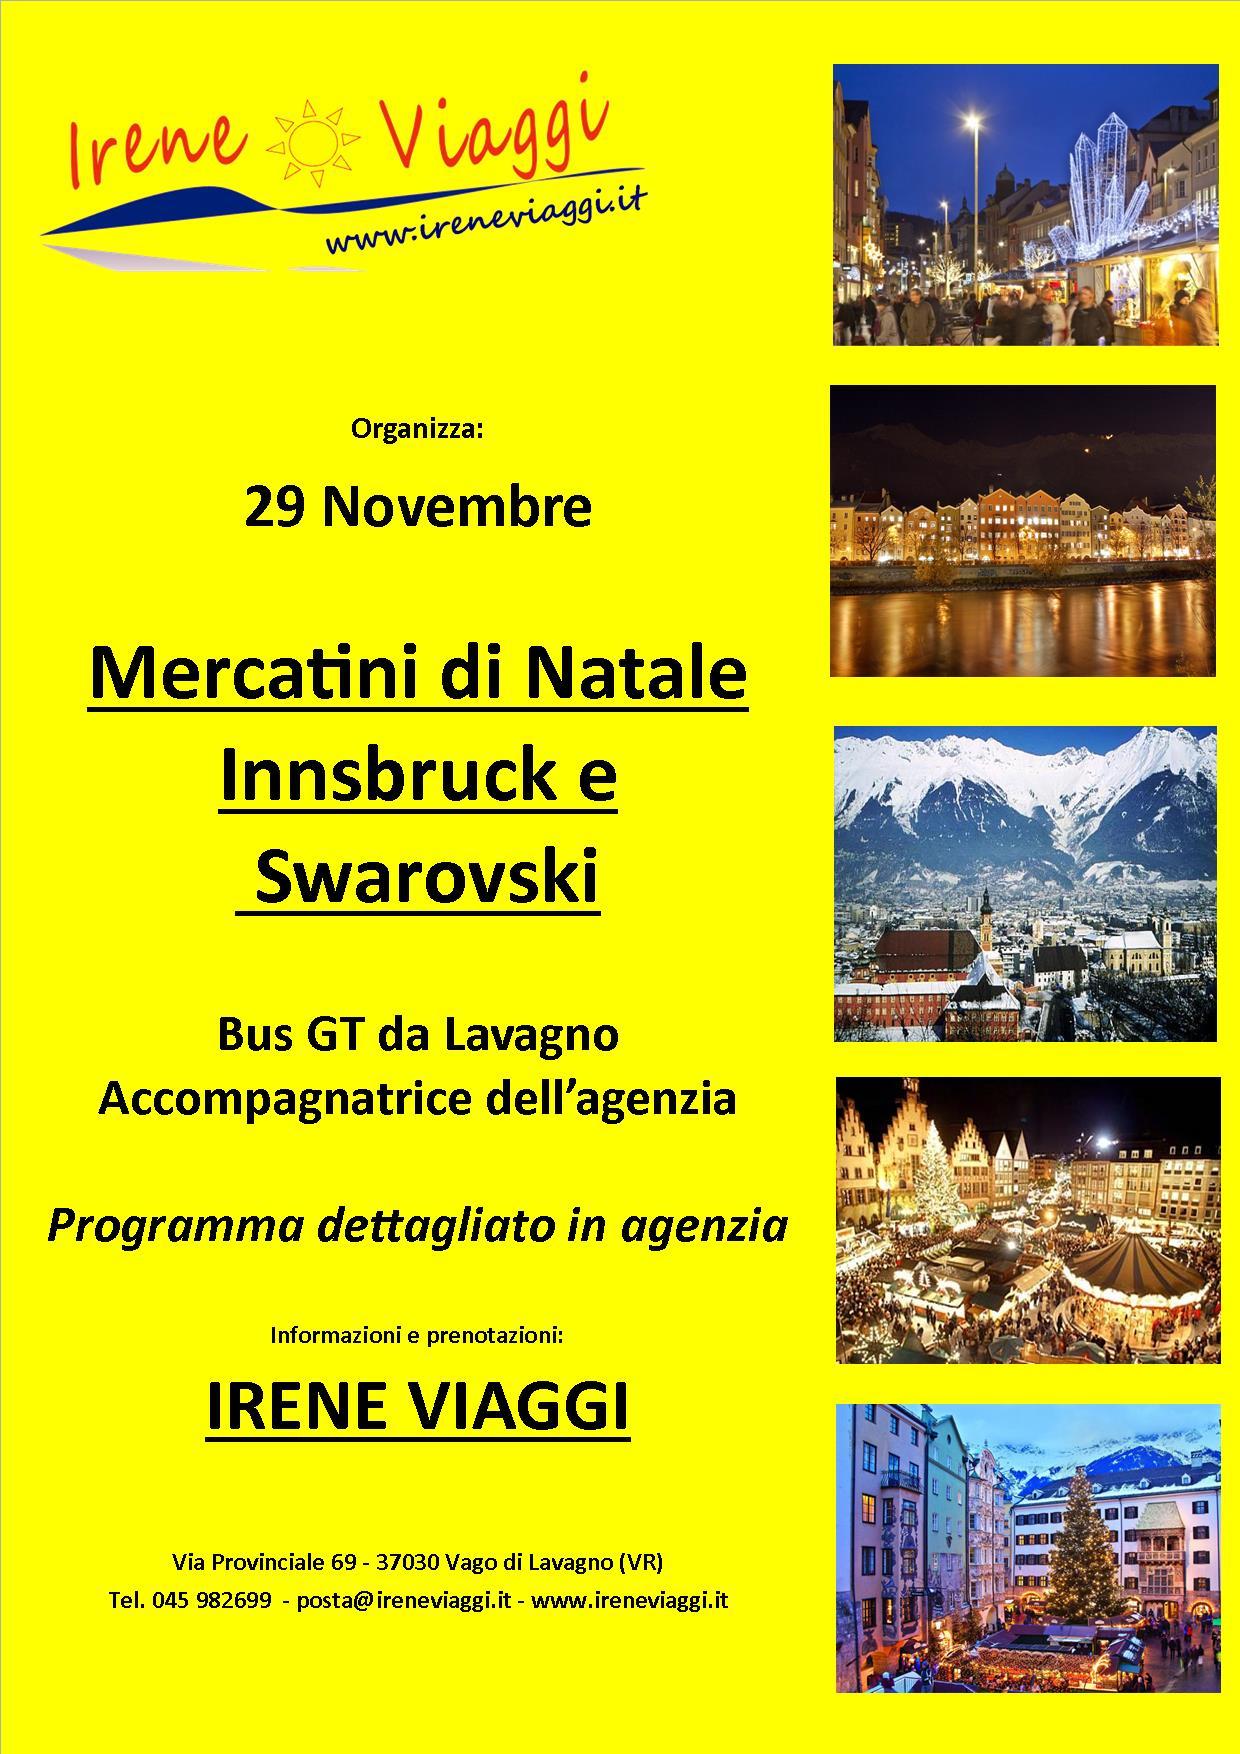 Innsbruck e Swarovski